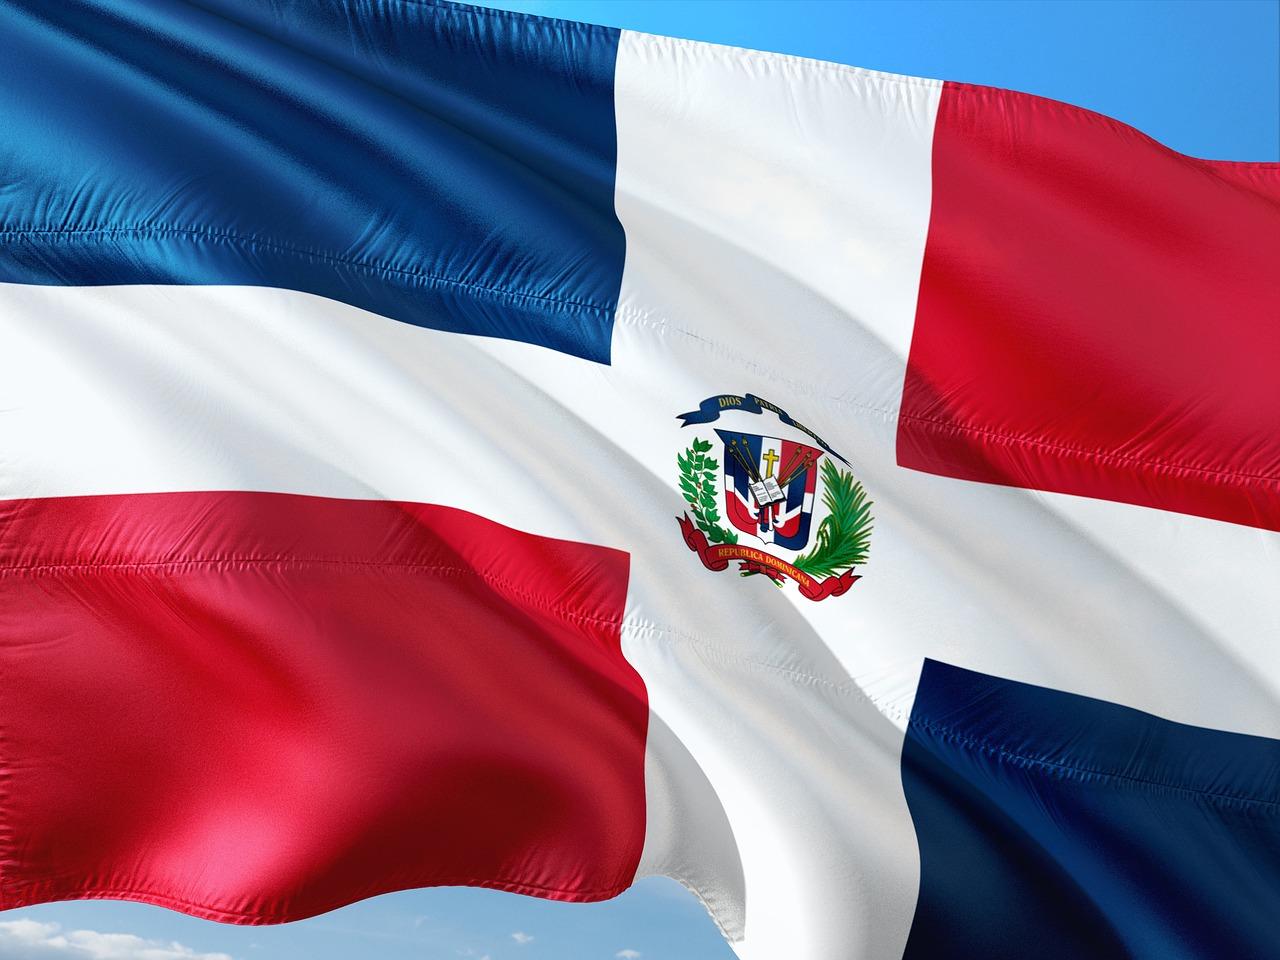 Incontrolable: El cruce de ilegales haitianos burla cordón militar fronterizo